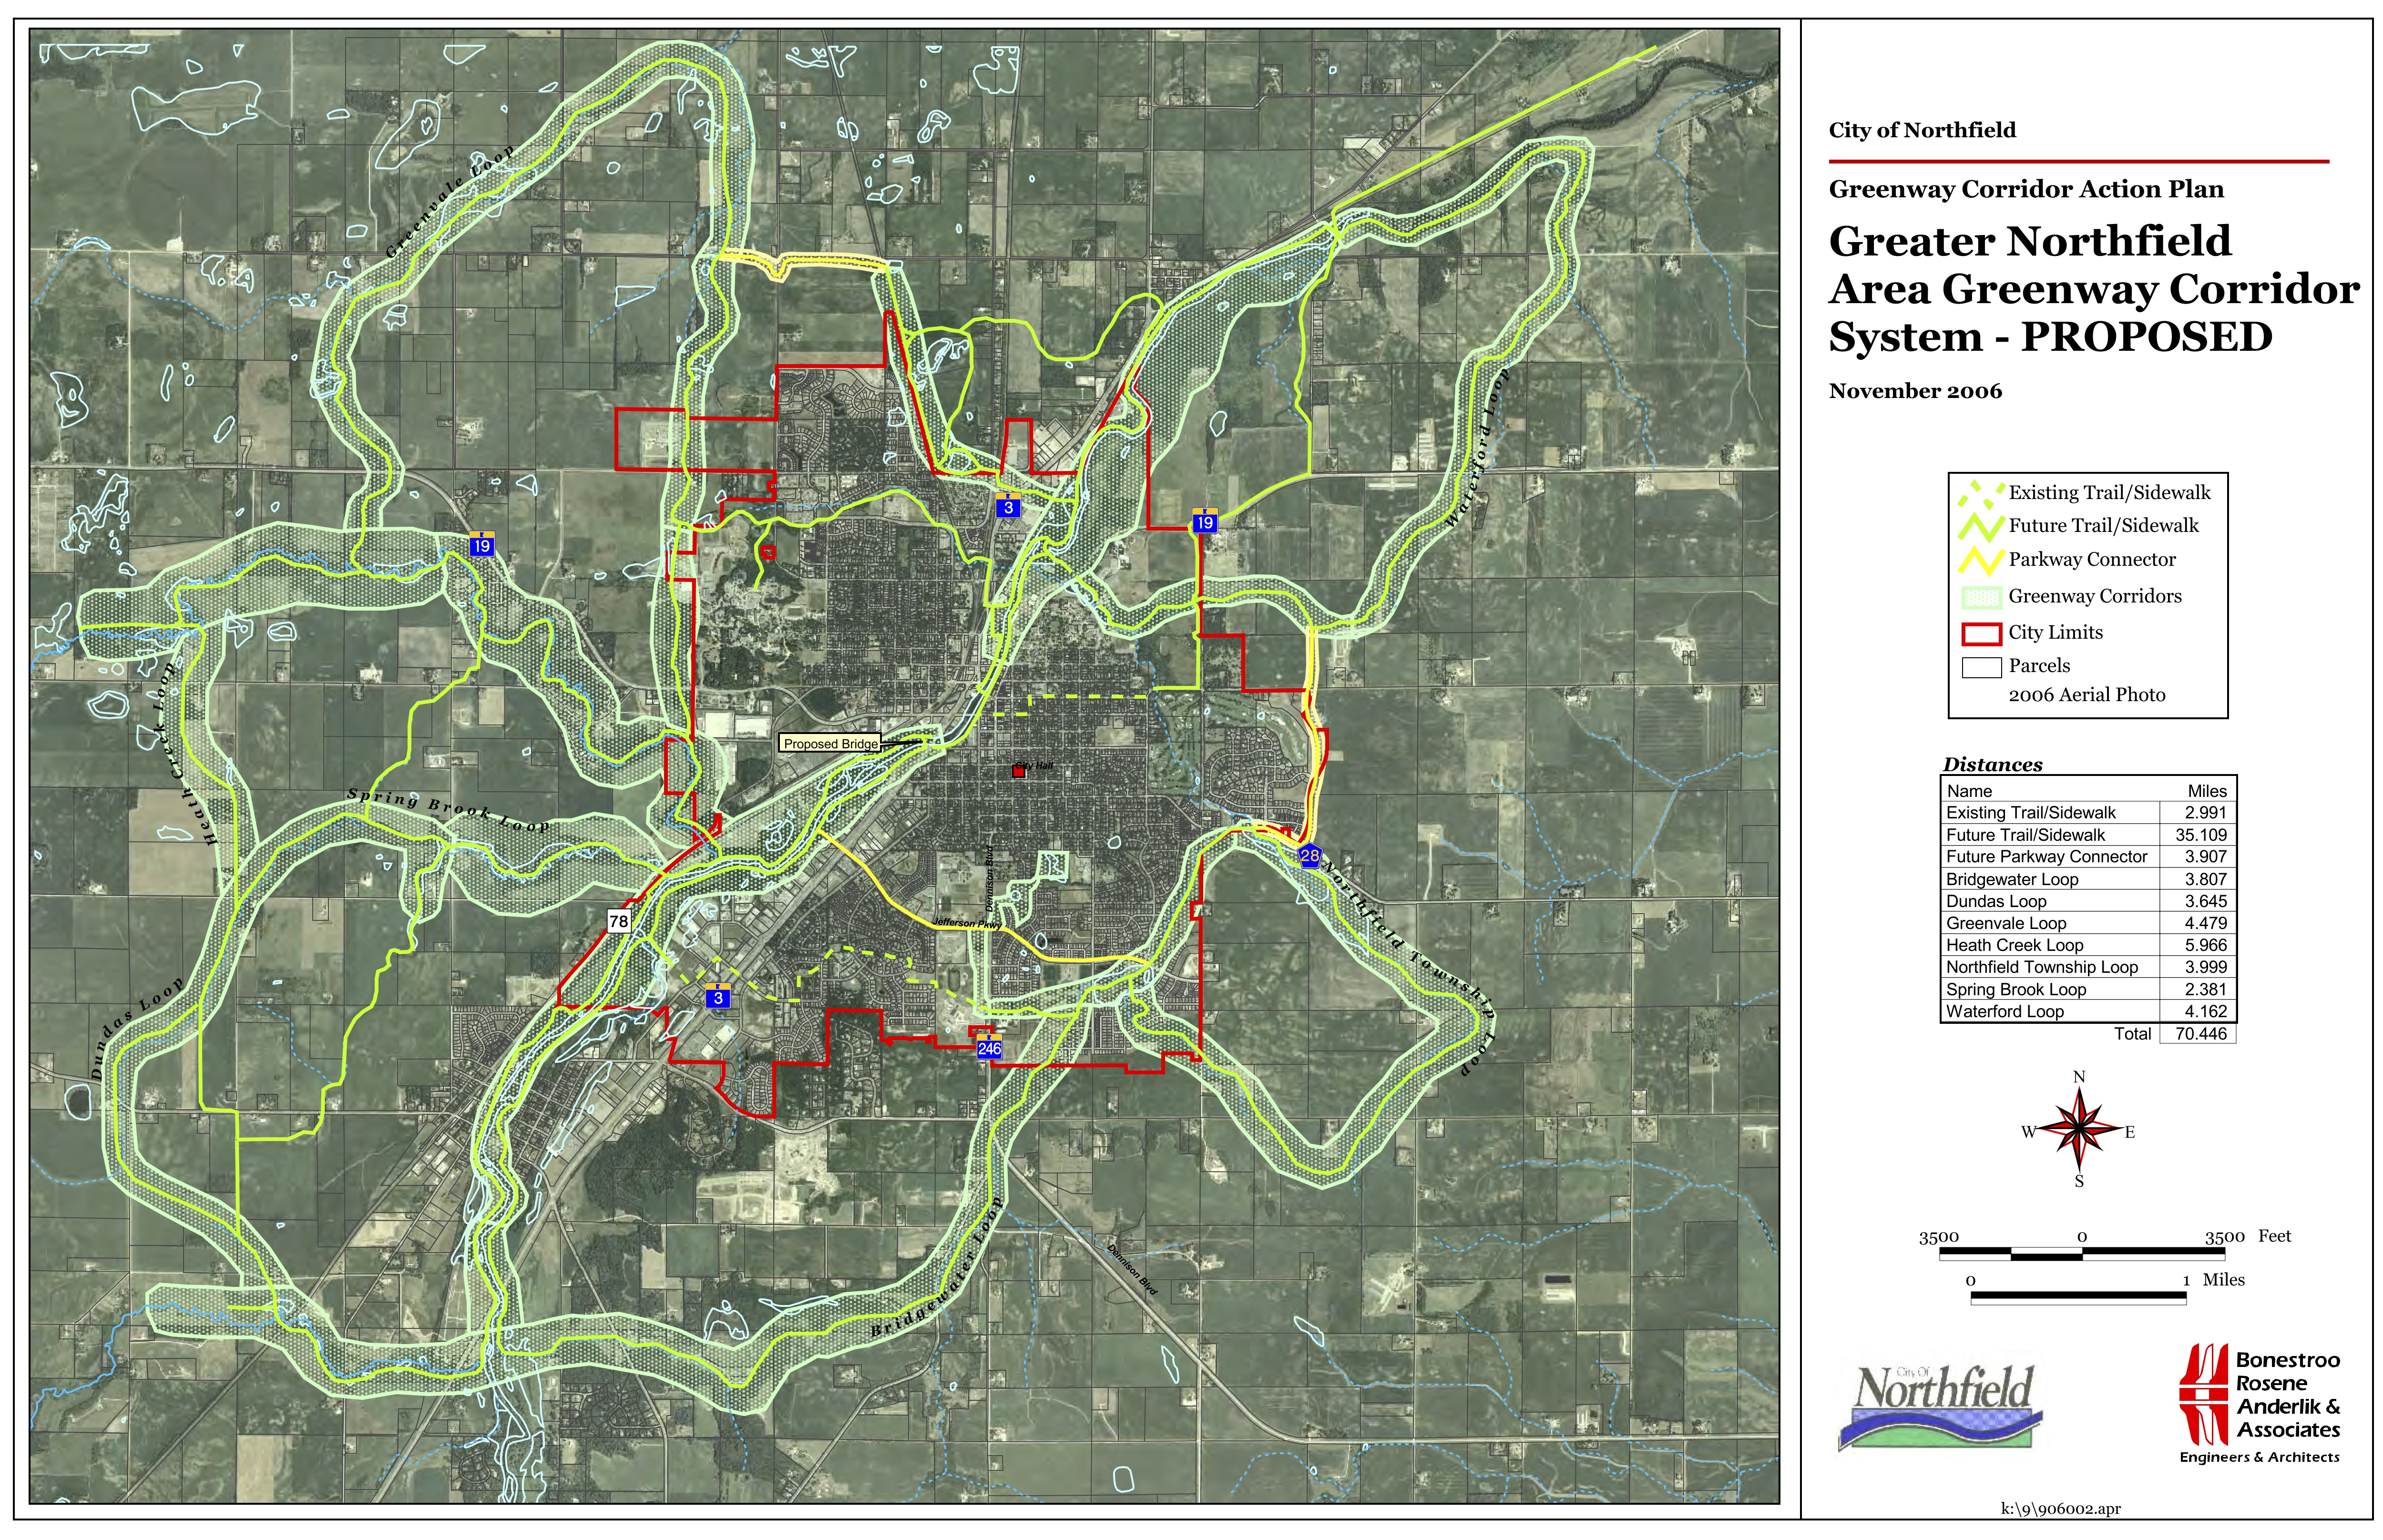 Northfield Greenway Corridors system map